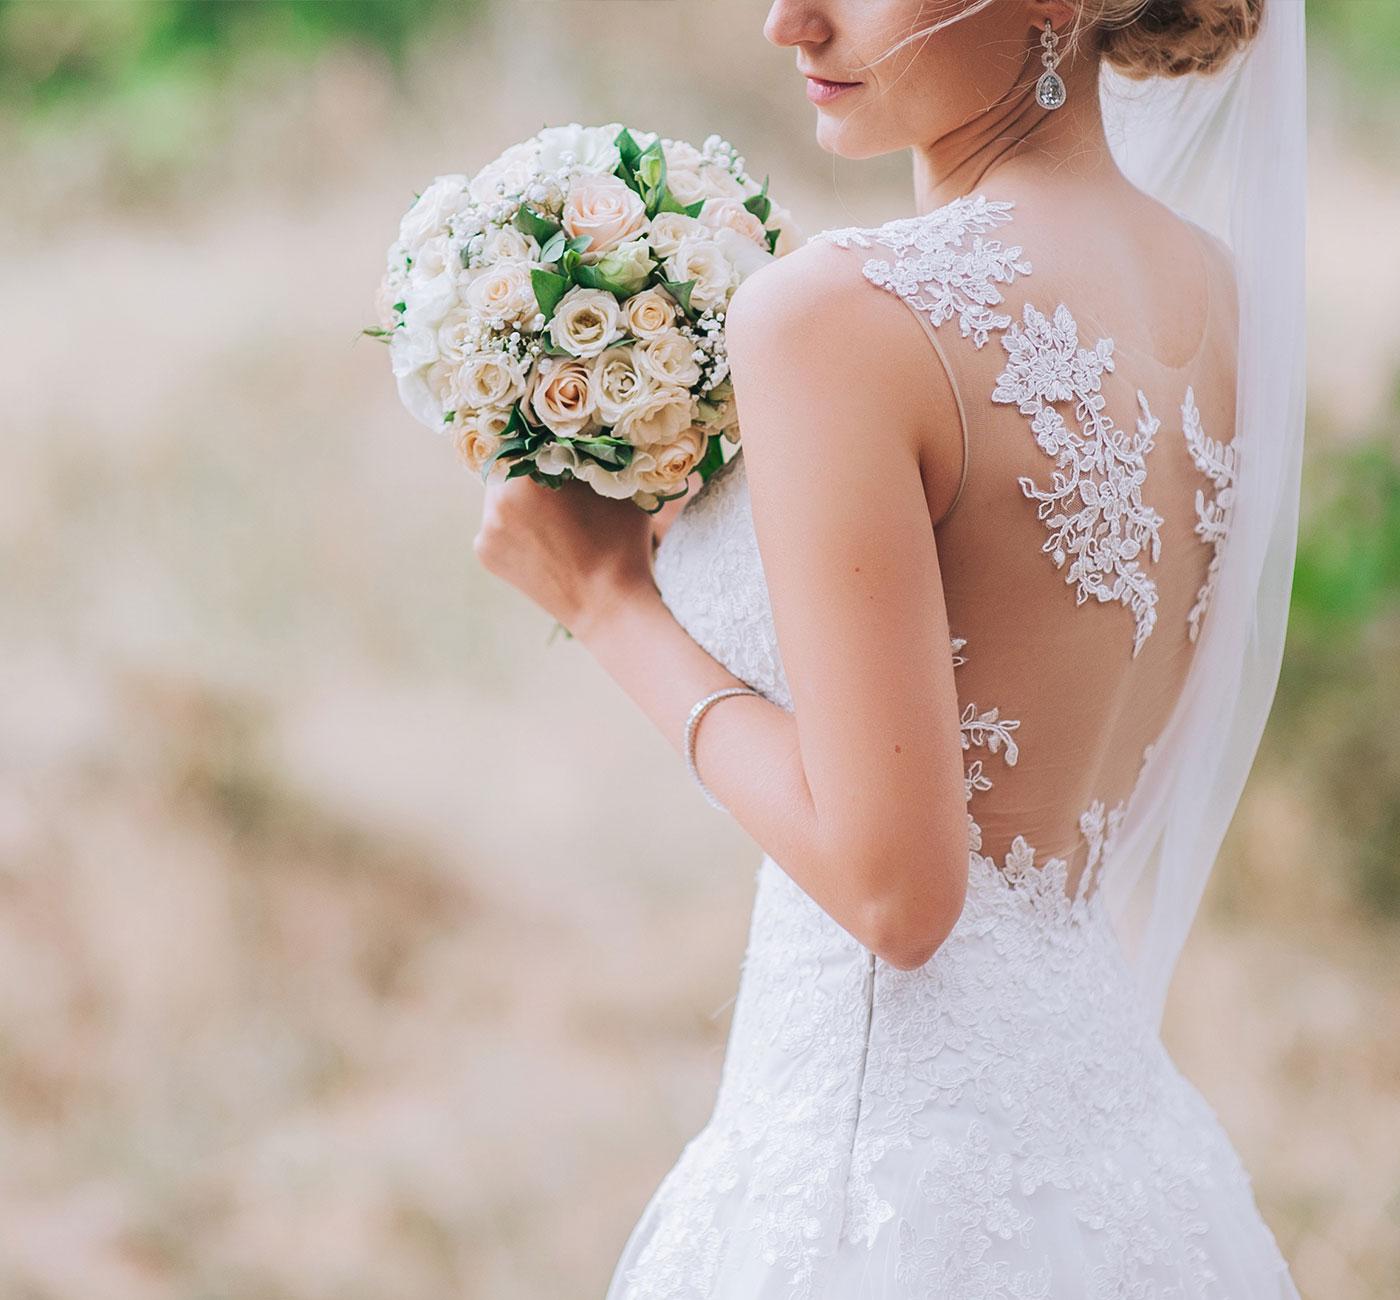 The Best Naples Weddings 2